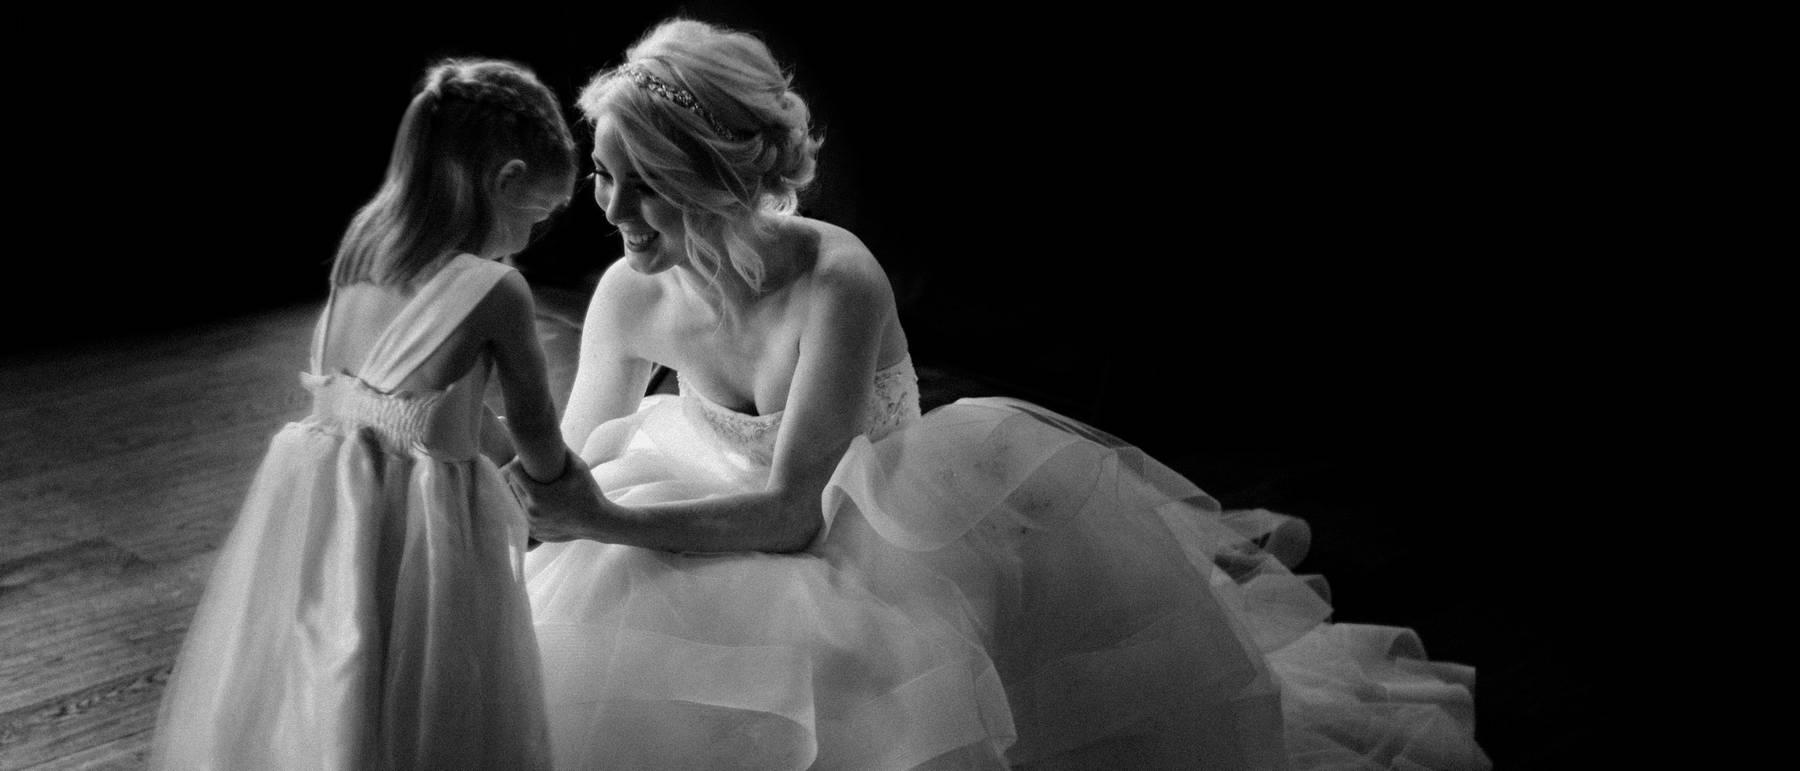 johnandjoseph-wedding-photographer-hz-slider-127